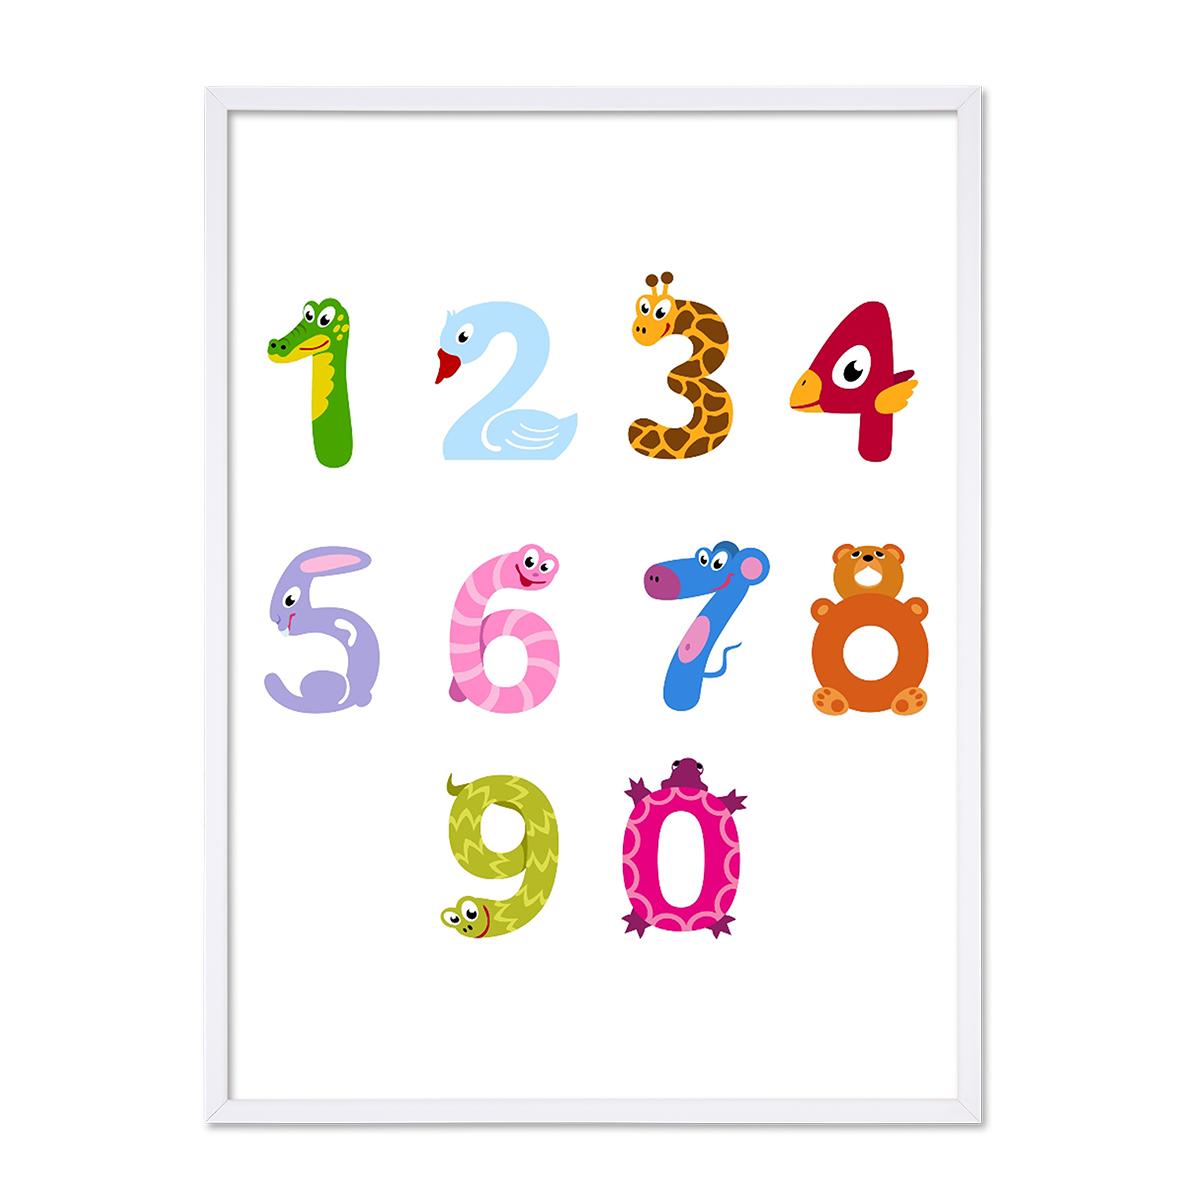 Poster Ziffern 20x20 cm Kinderposter Motiv Zahlen Lernposter Bunt